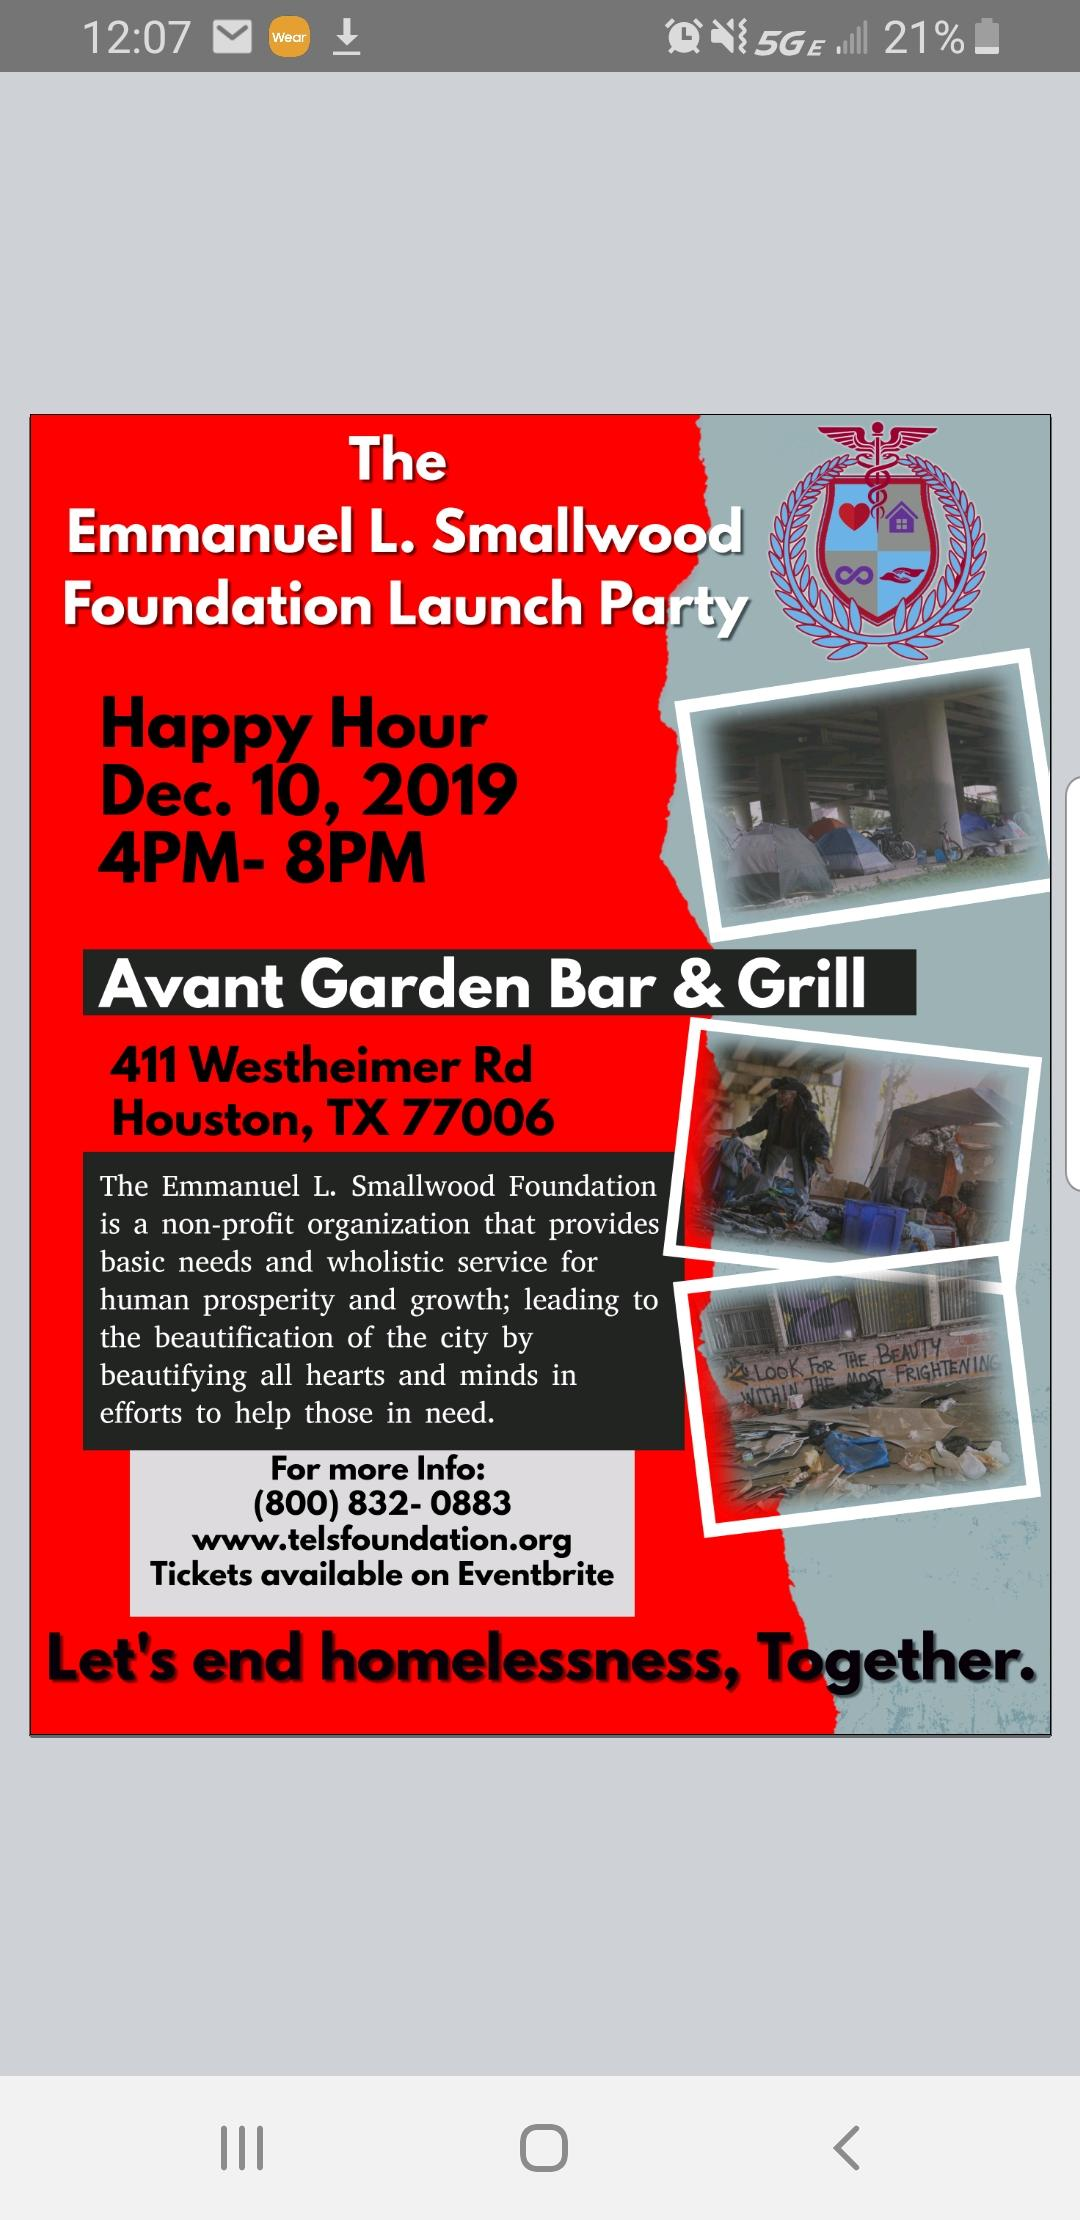 The Emmanuel L Smallwood Foundation Launch Party